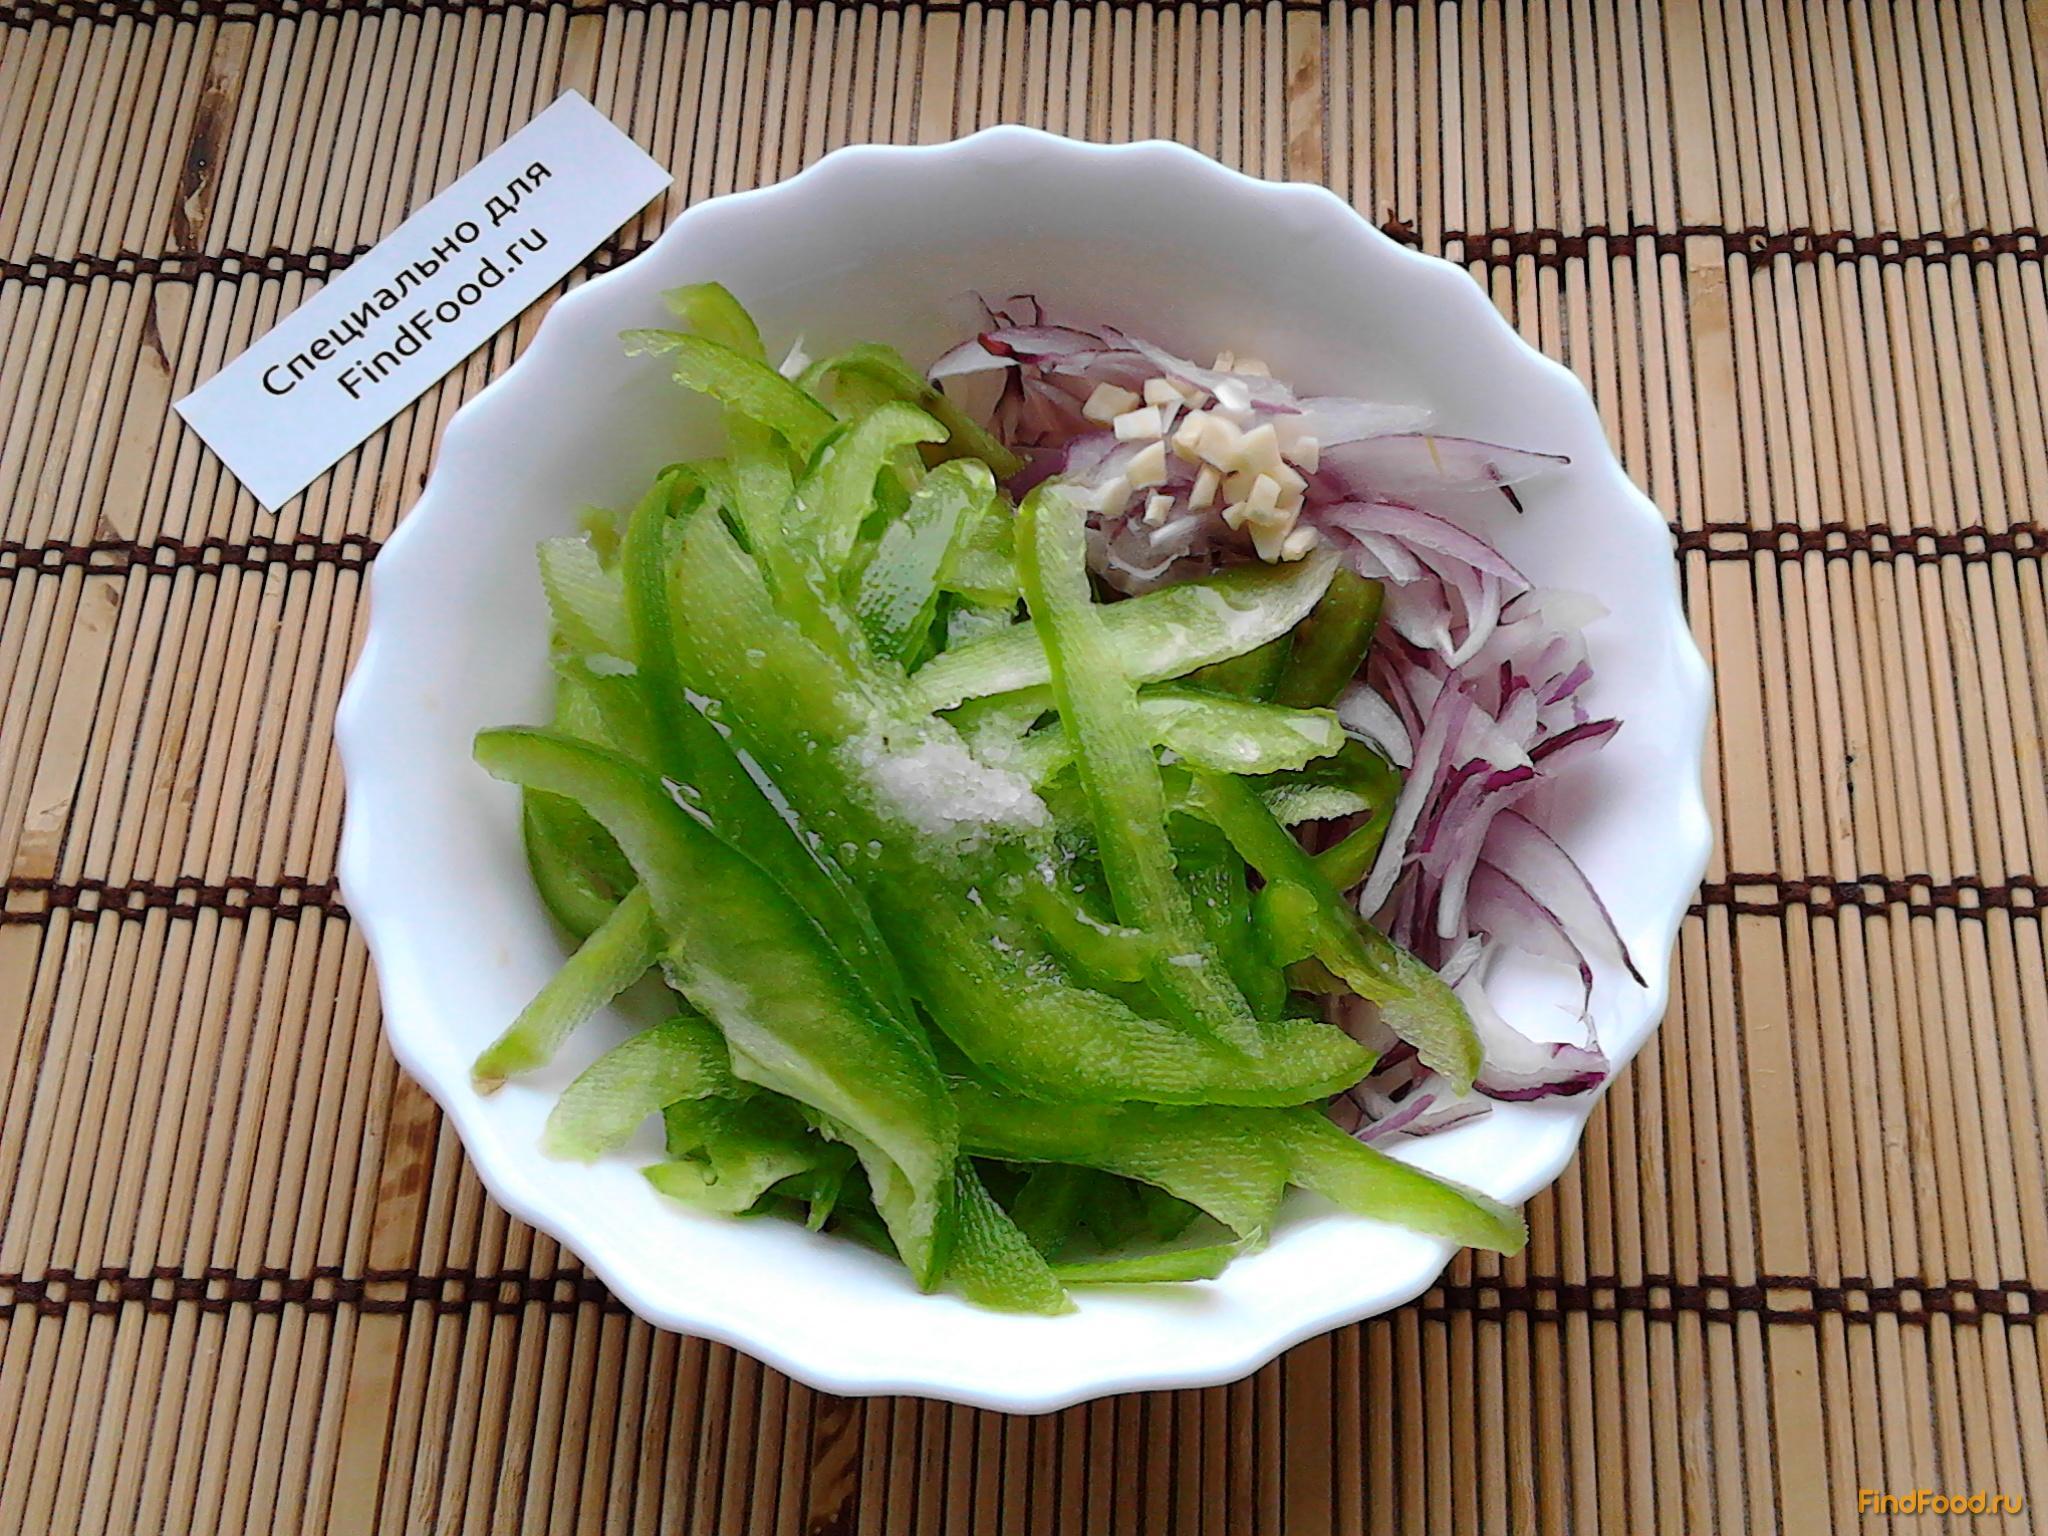 Салат из болгарского перца с луком рецепт с фото 5-го шага